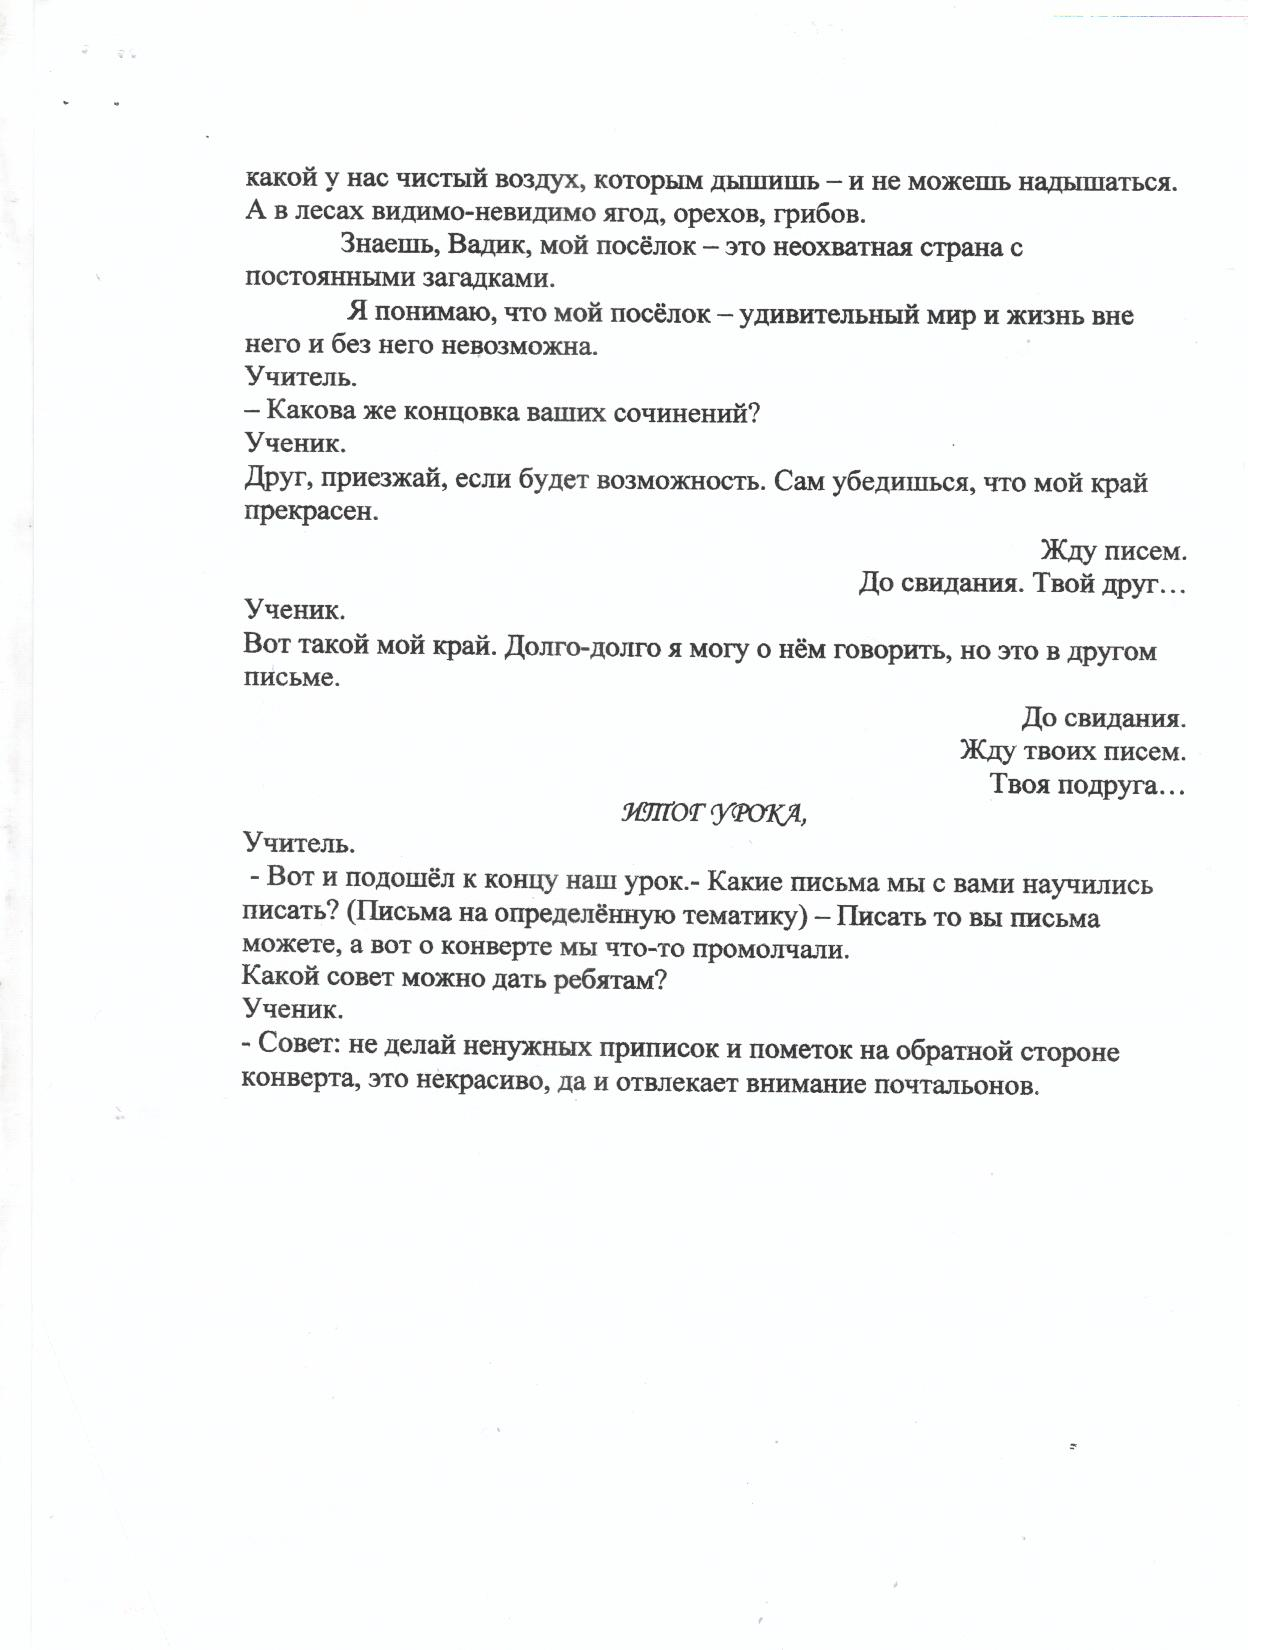 H:\сканер работ\Урок письма\стр9.jpg